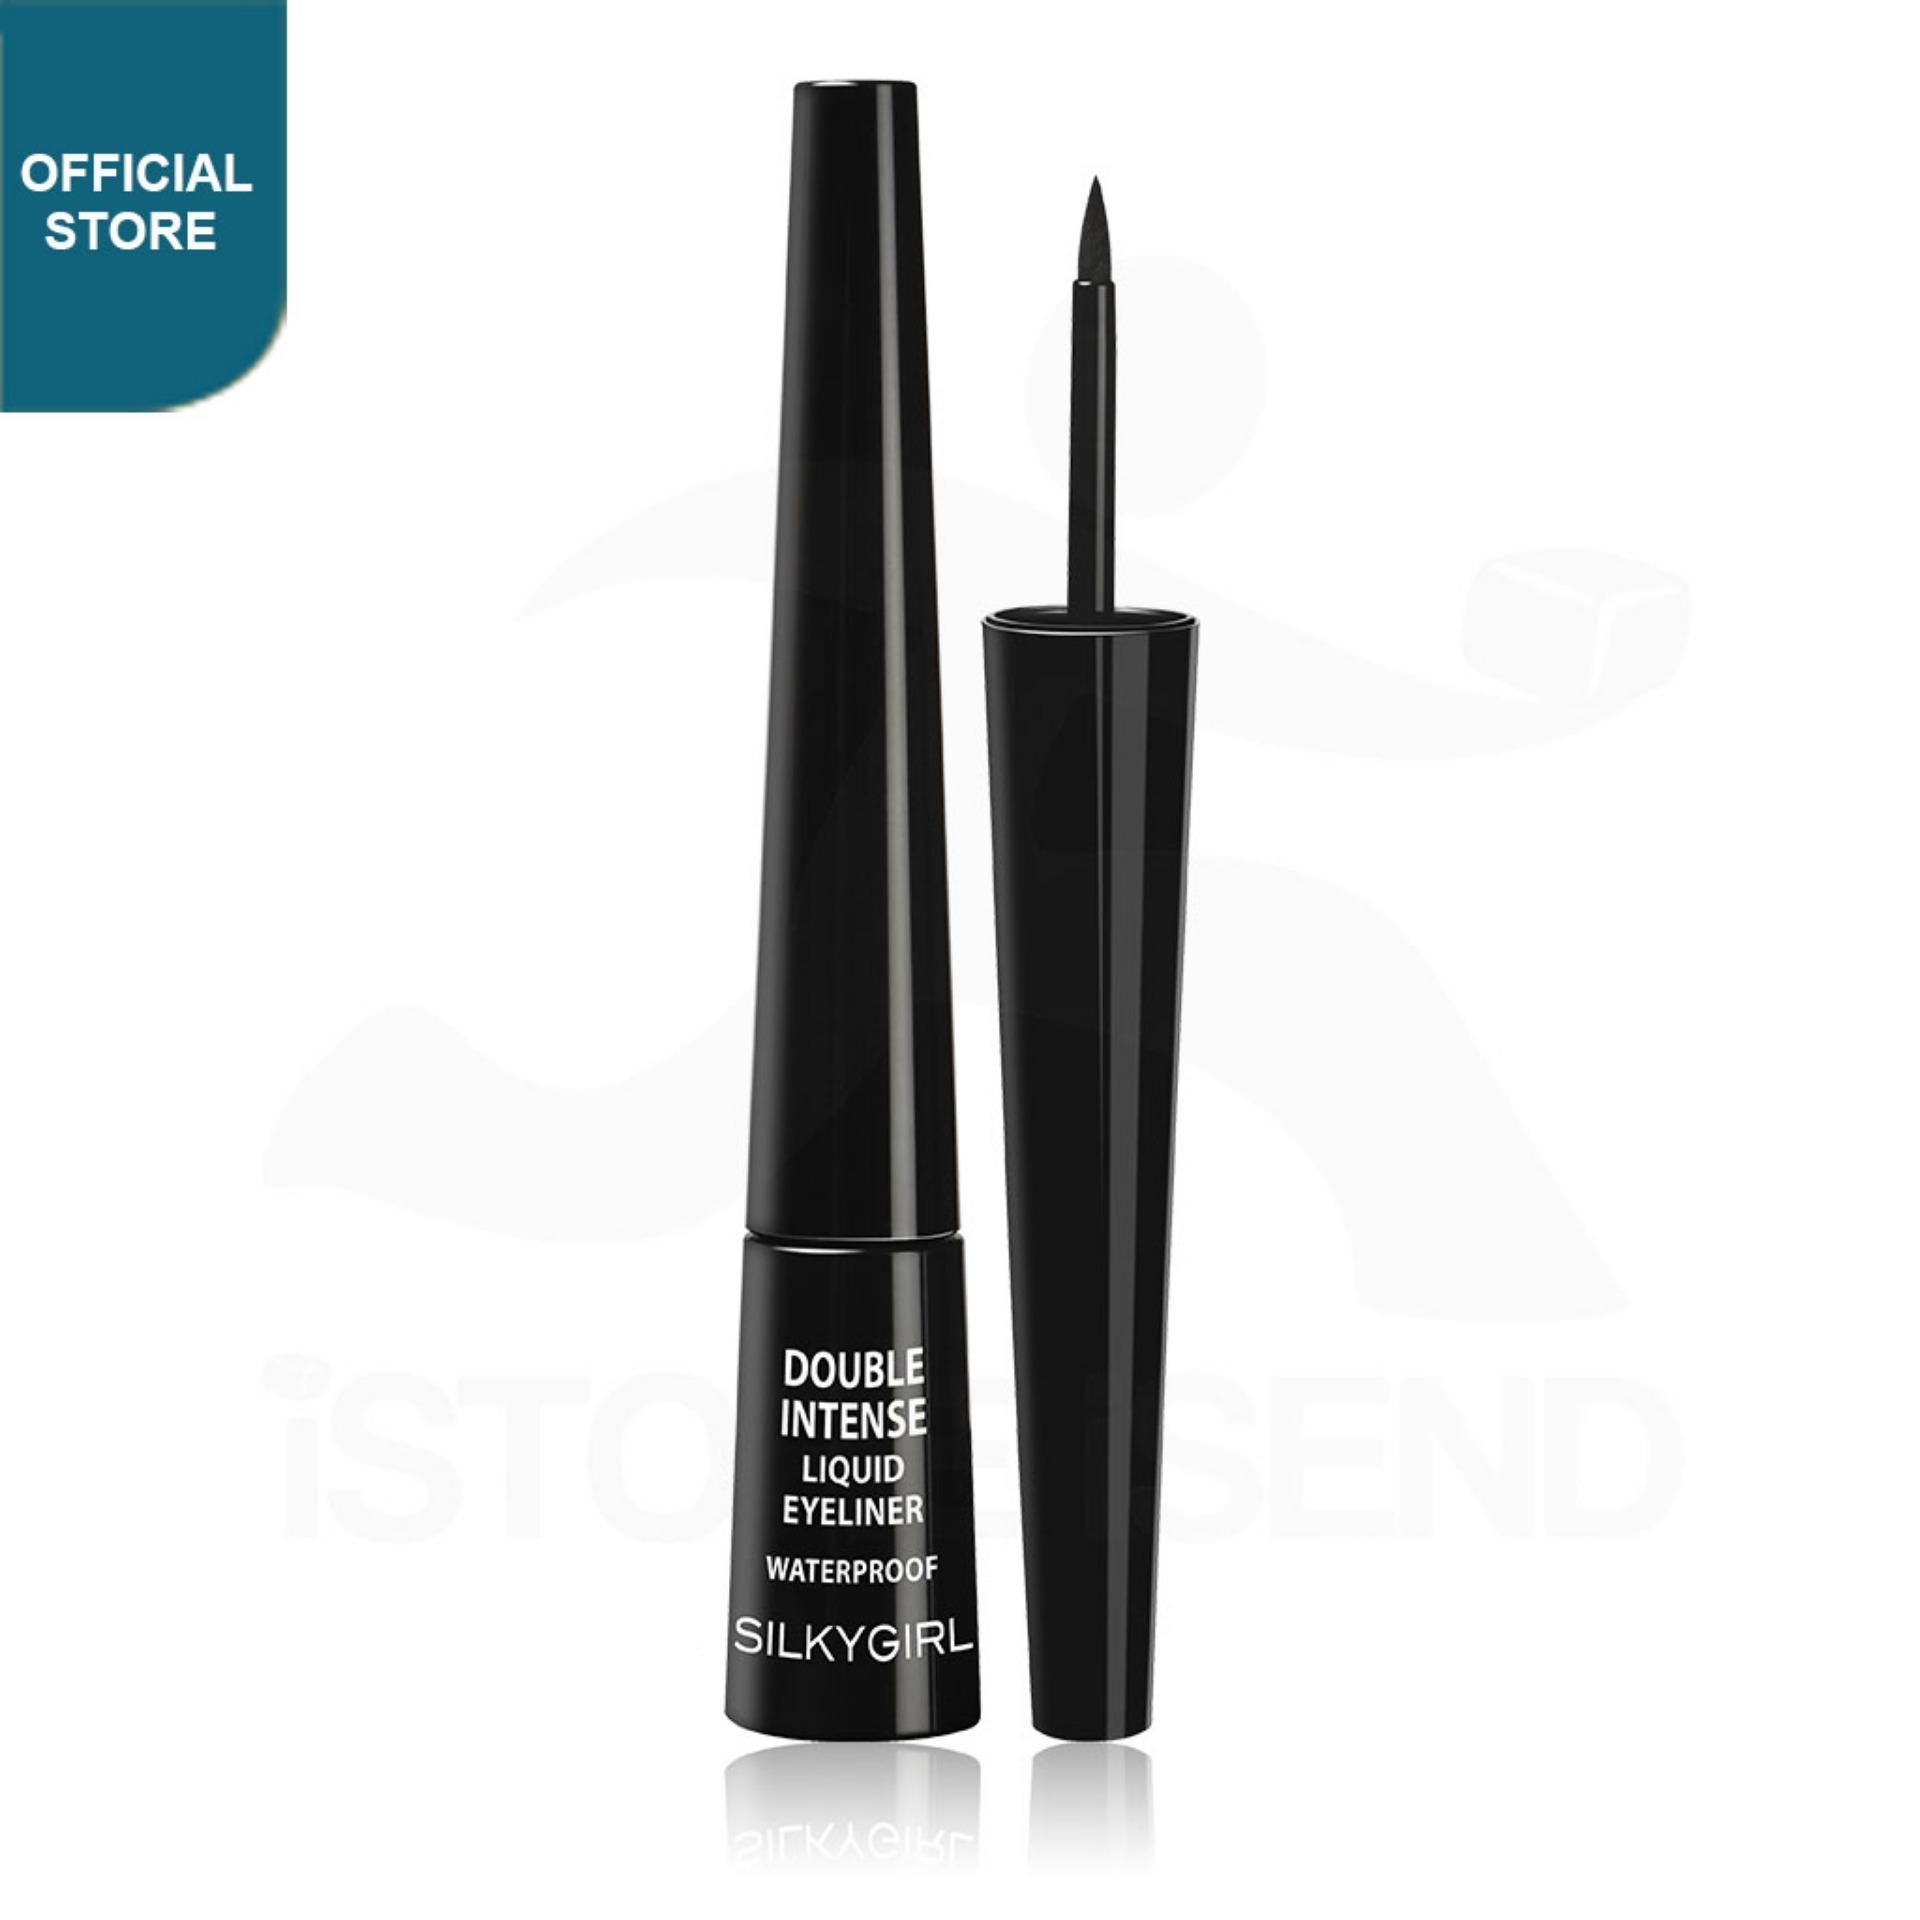 SILKYGIRL Double Intense Liquid Eyeliner 01 Blackest Black (GE0220-01)